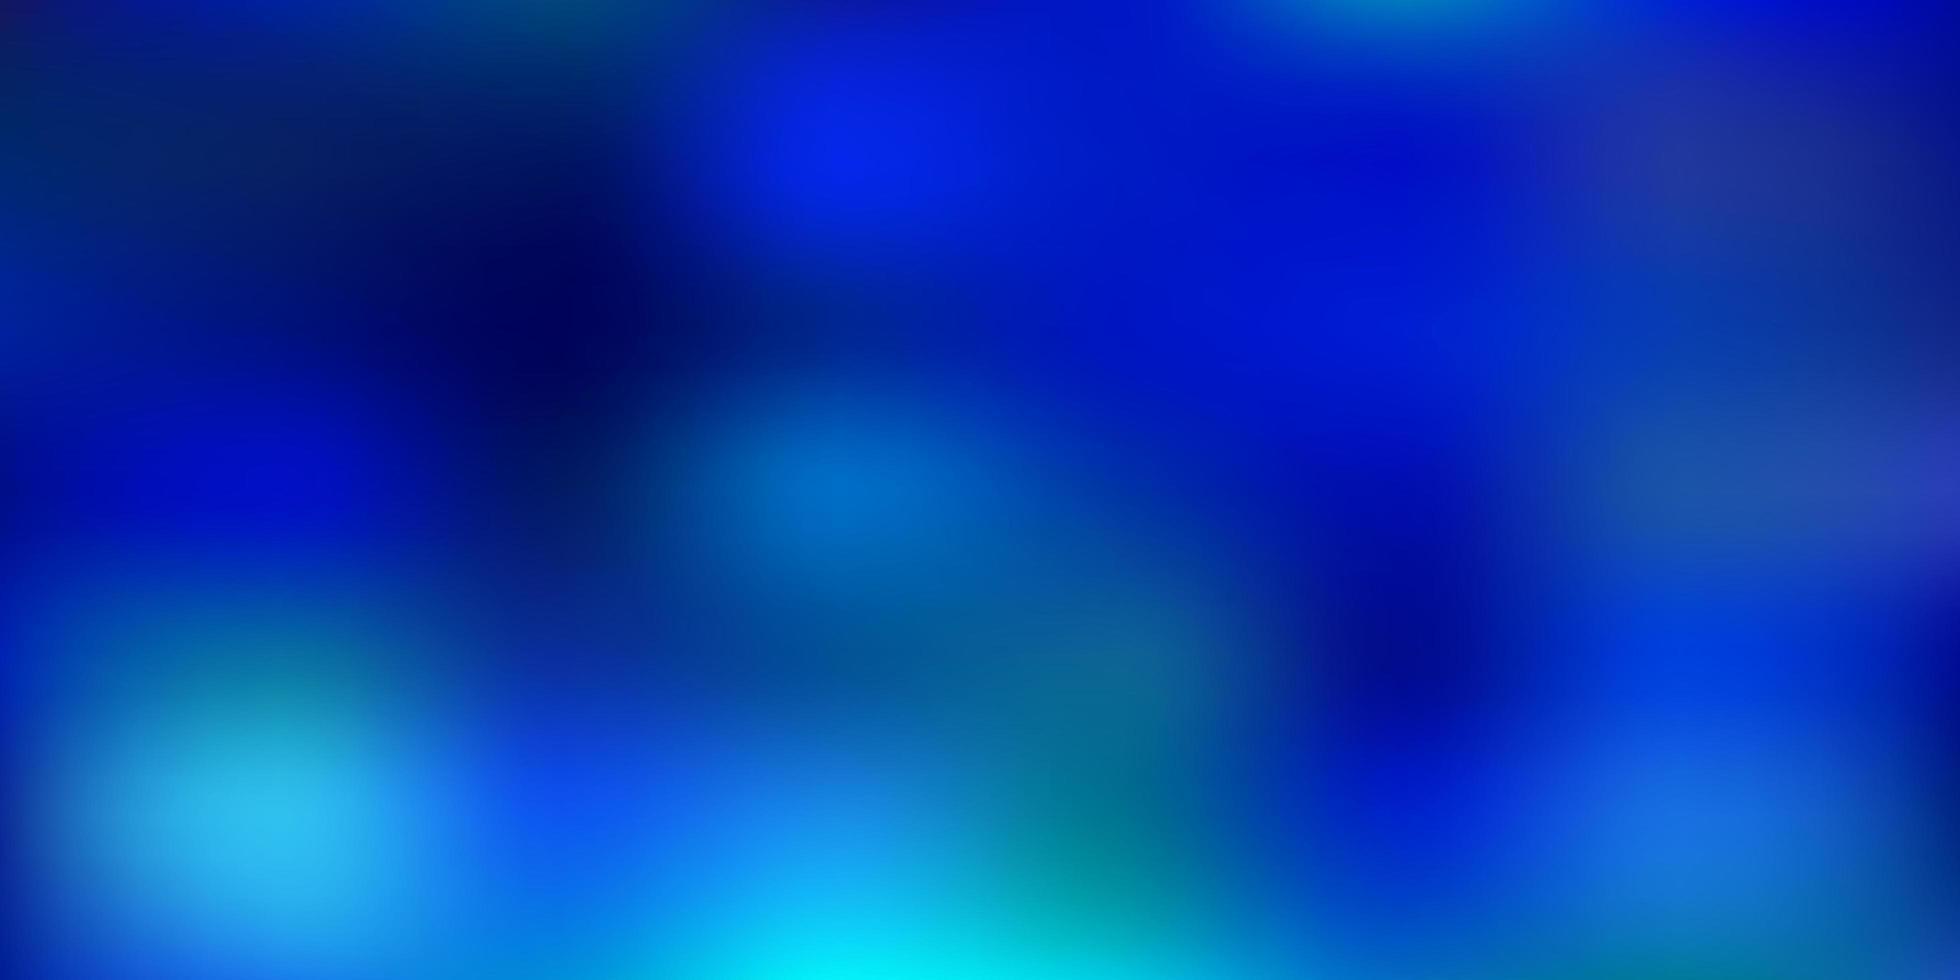 Light blue vector blurred pattern.